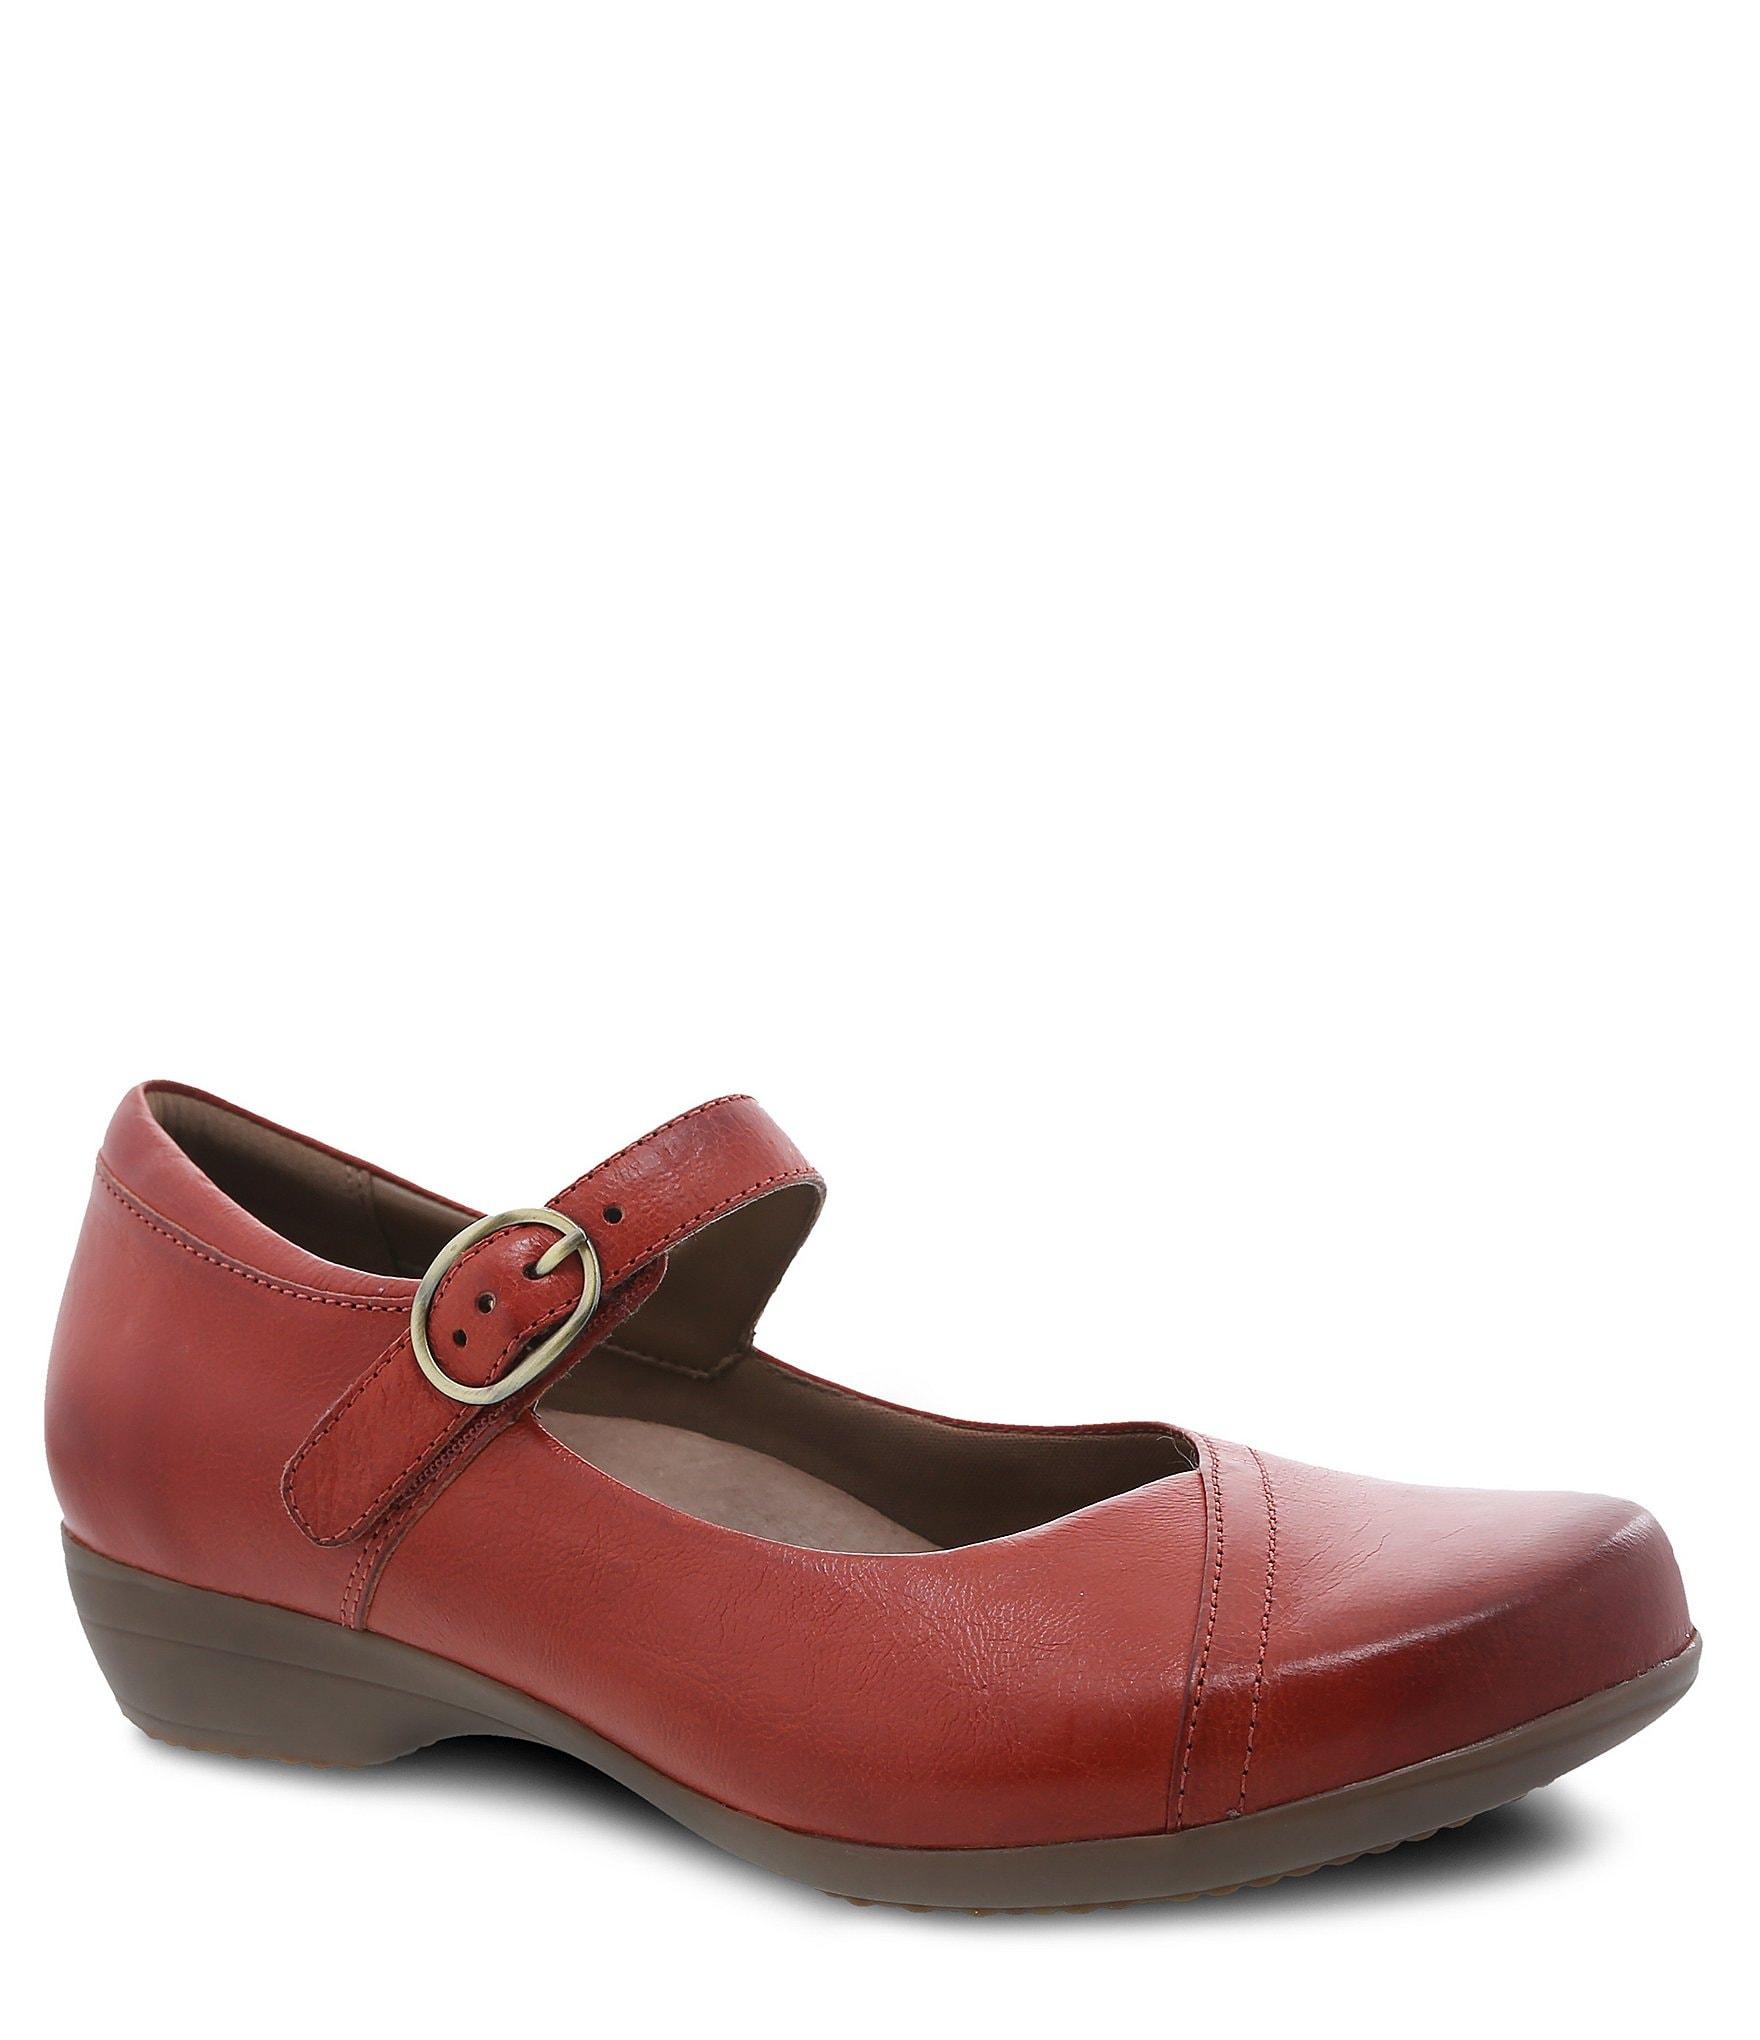 cc597eaeff3 Sale   Clearance Shoes